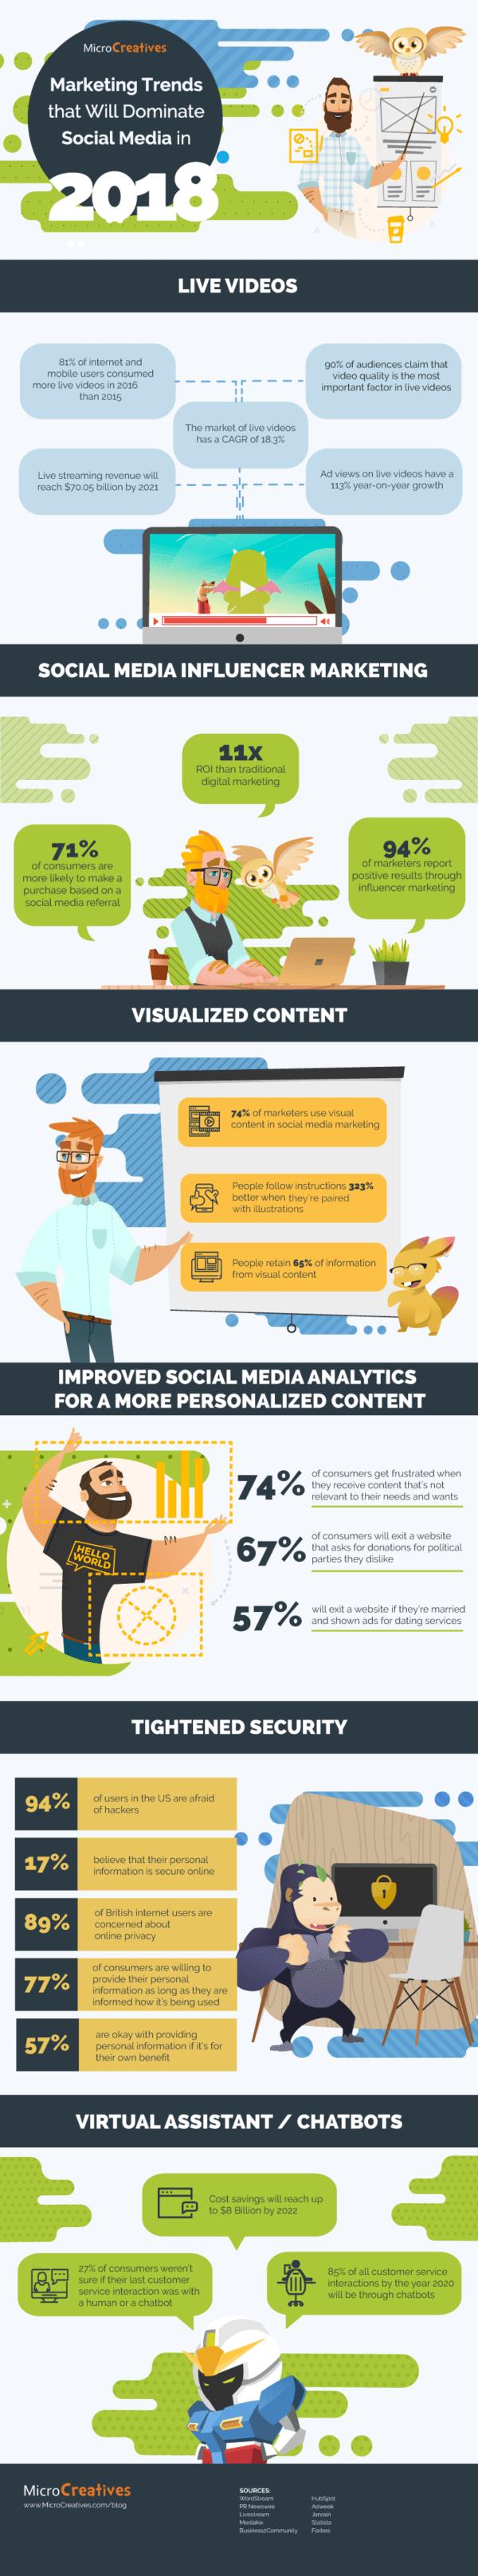 Advertising on Social Media: Defining Marketing Trends for 2018 - Infographic